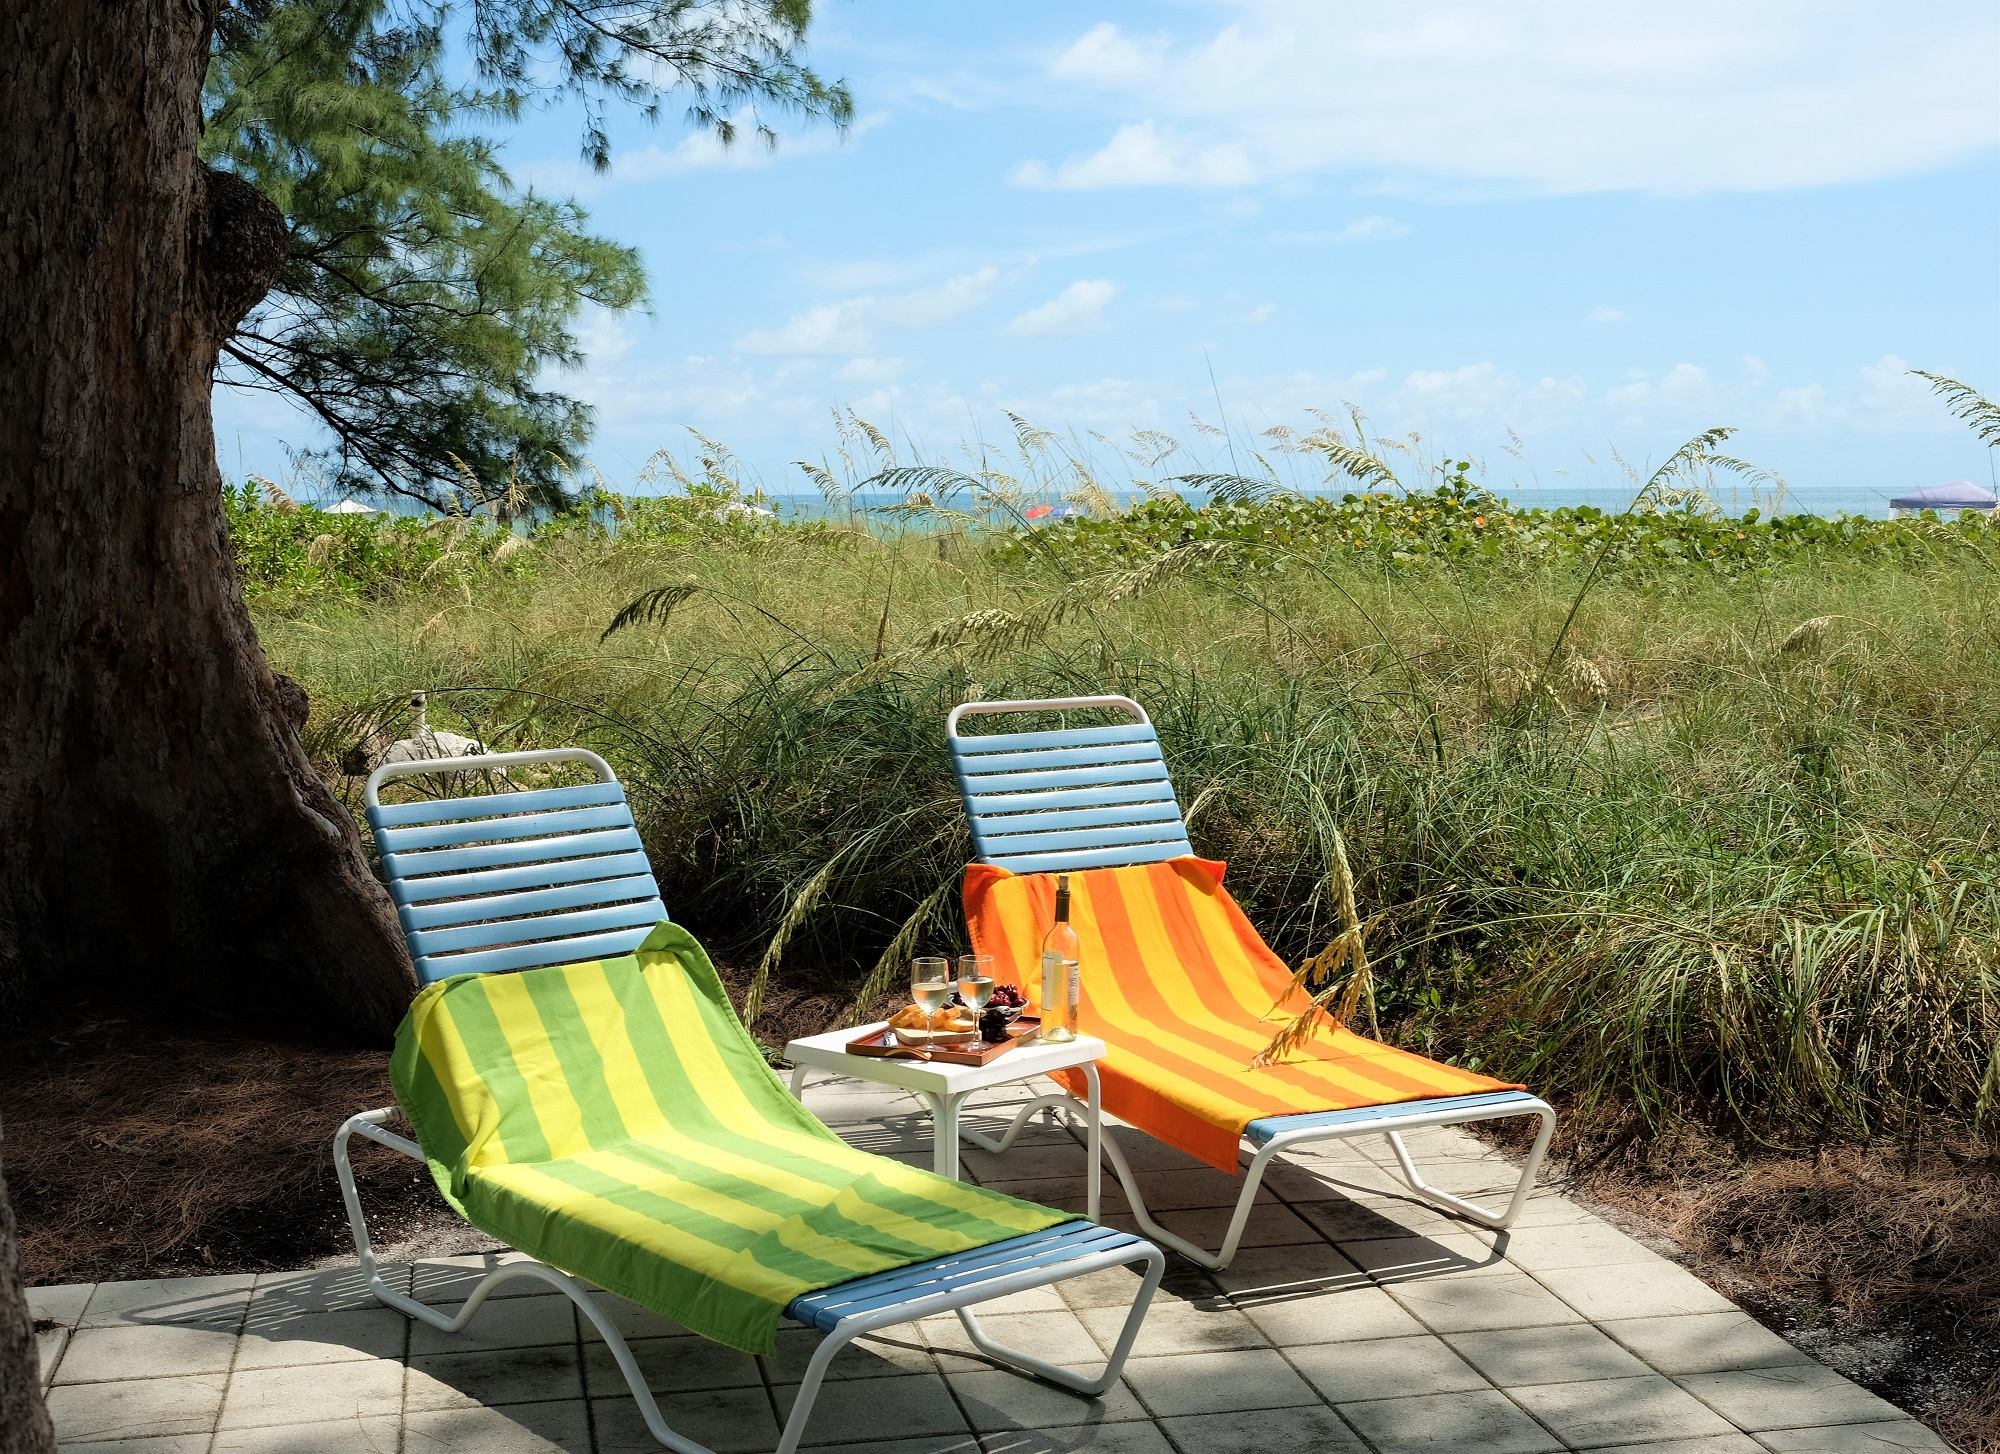 Wine and Chairs Bamboo Apartments Anna Maria Island, Florida